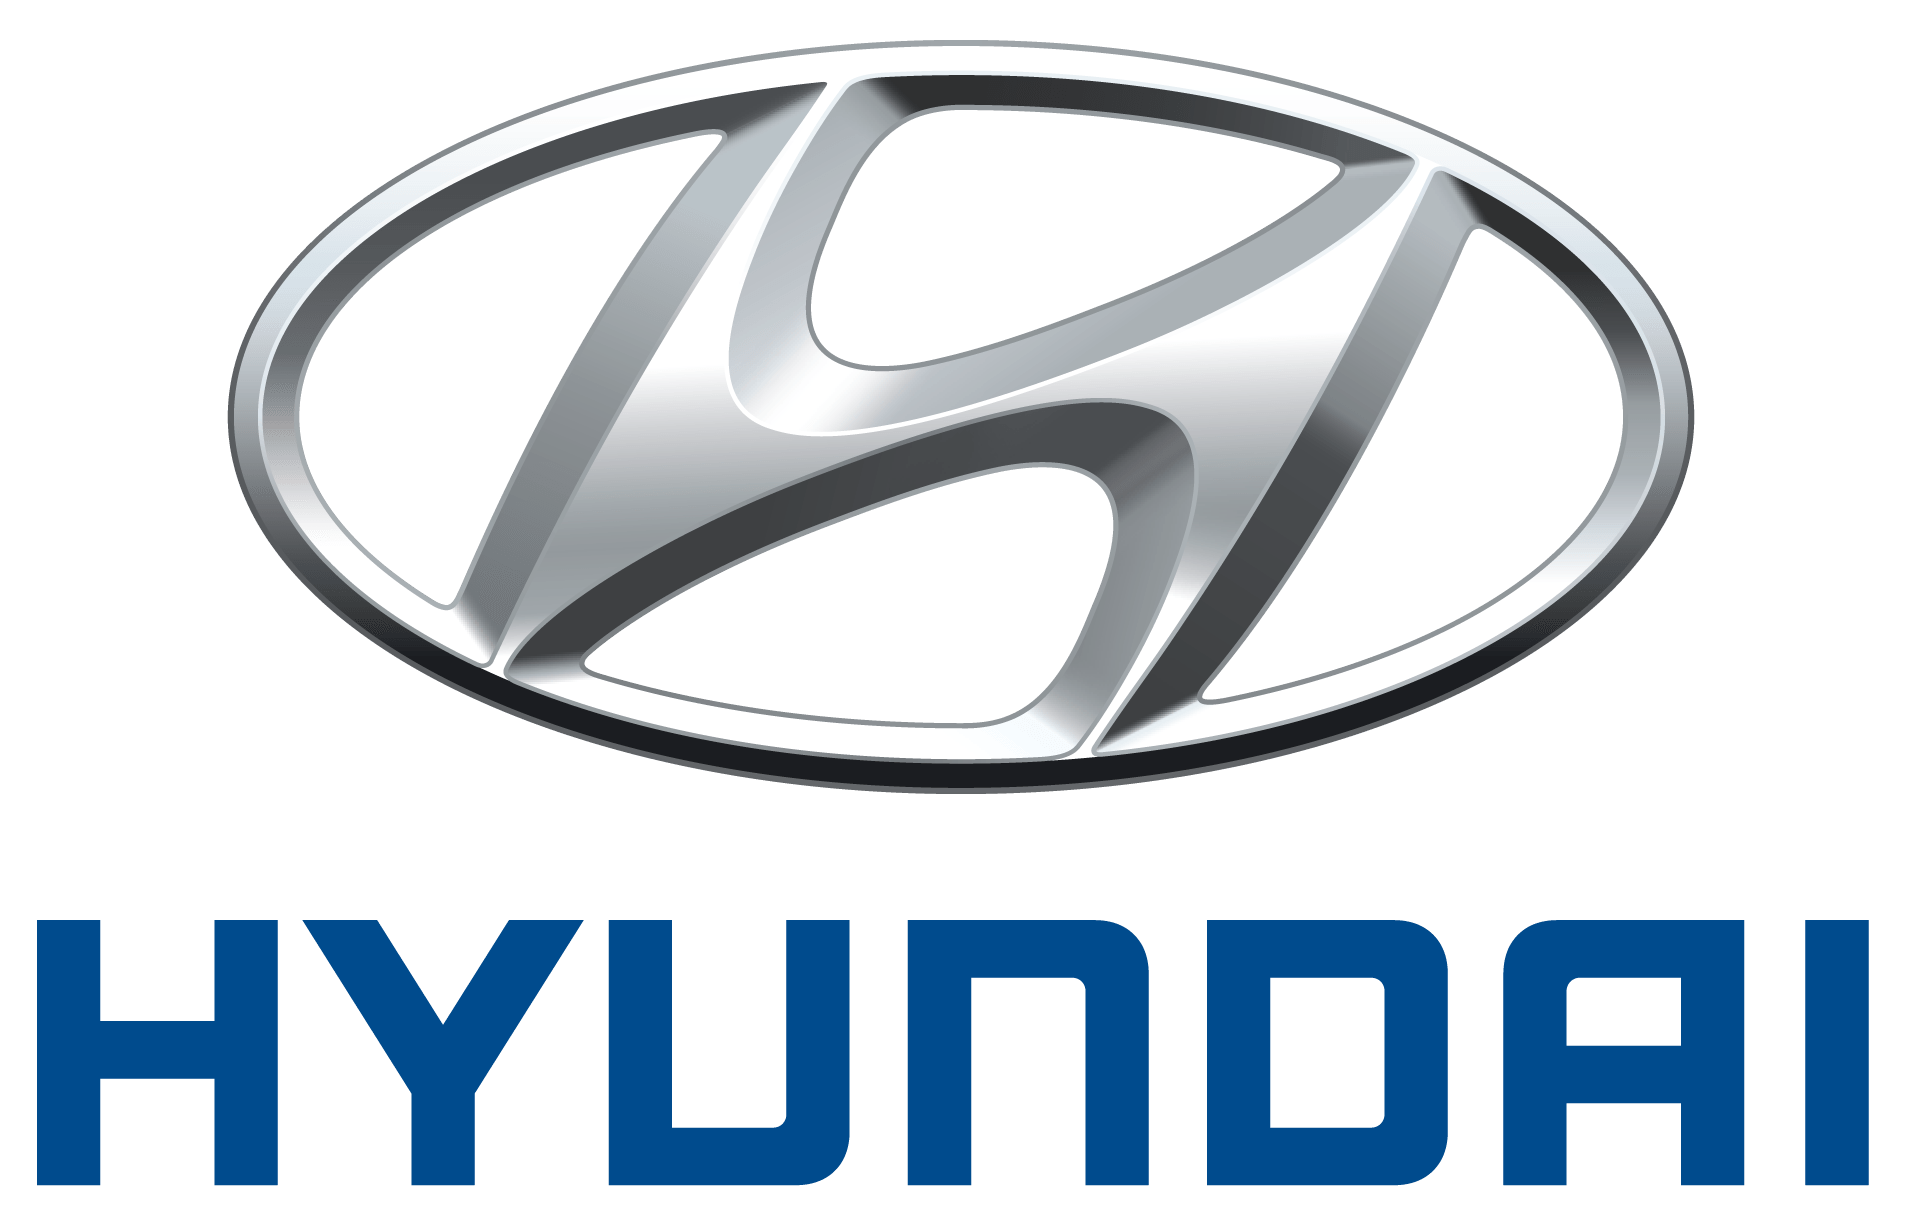 Dealer Mobil Hyundai Jakarta | Hyundai Grand i10, H-1, H-100, Ioniq Electric, Kona, Kona Electric, Palisade, Santa Fe, Starex Mover, Tucson.